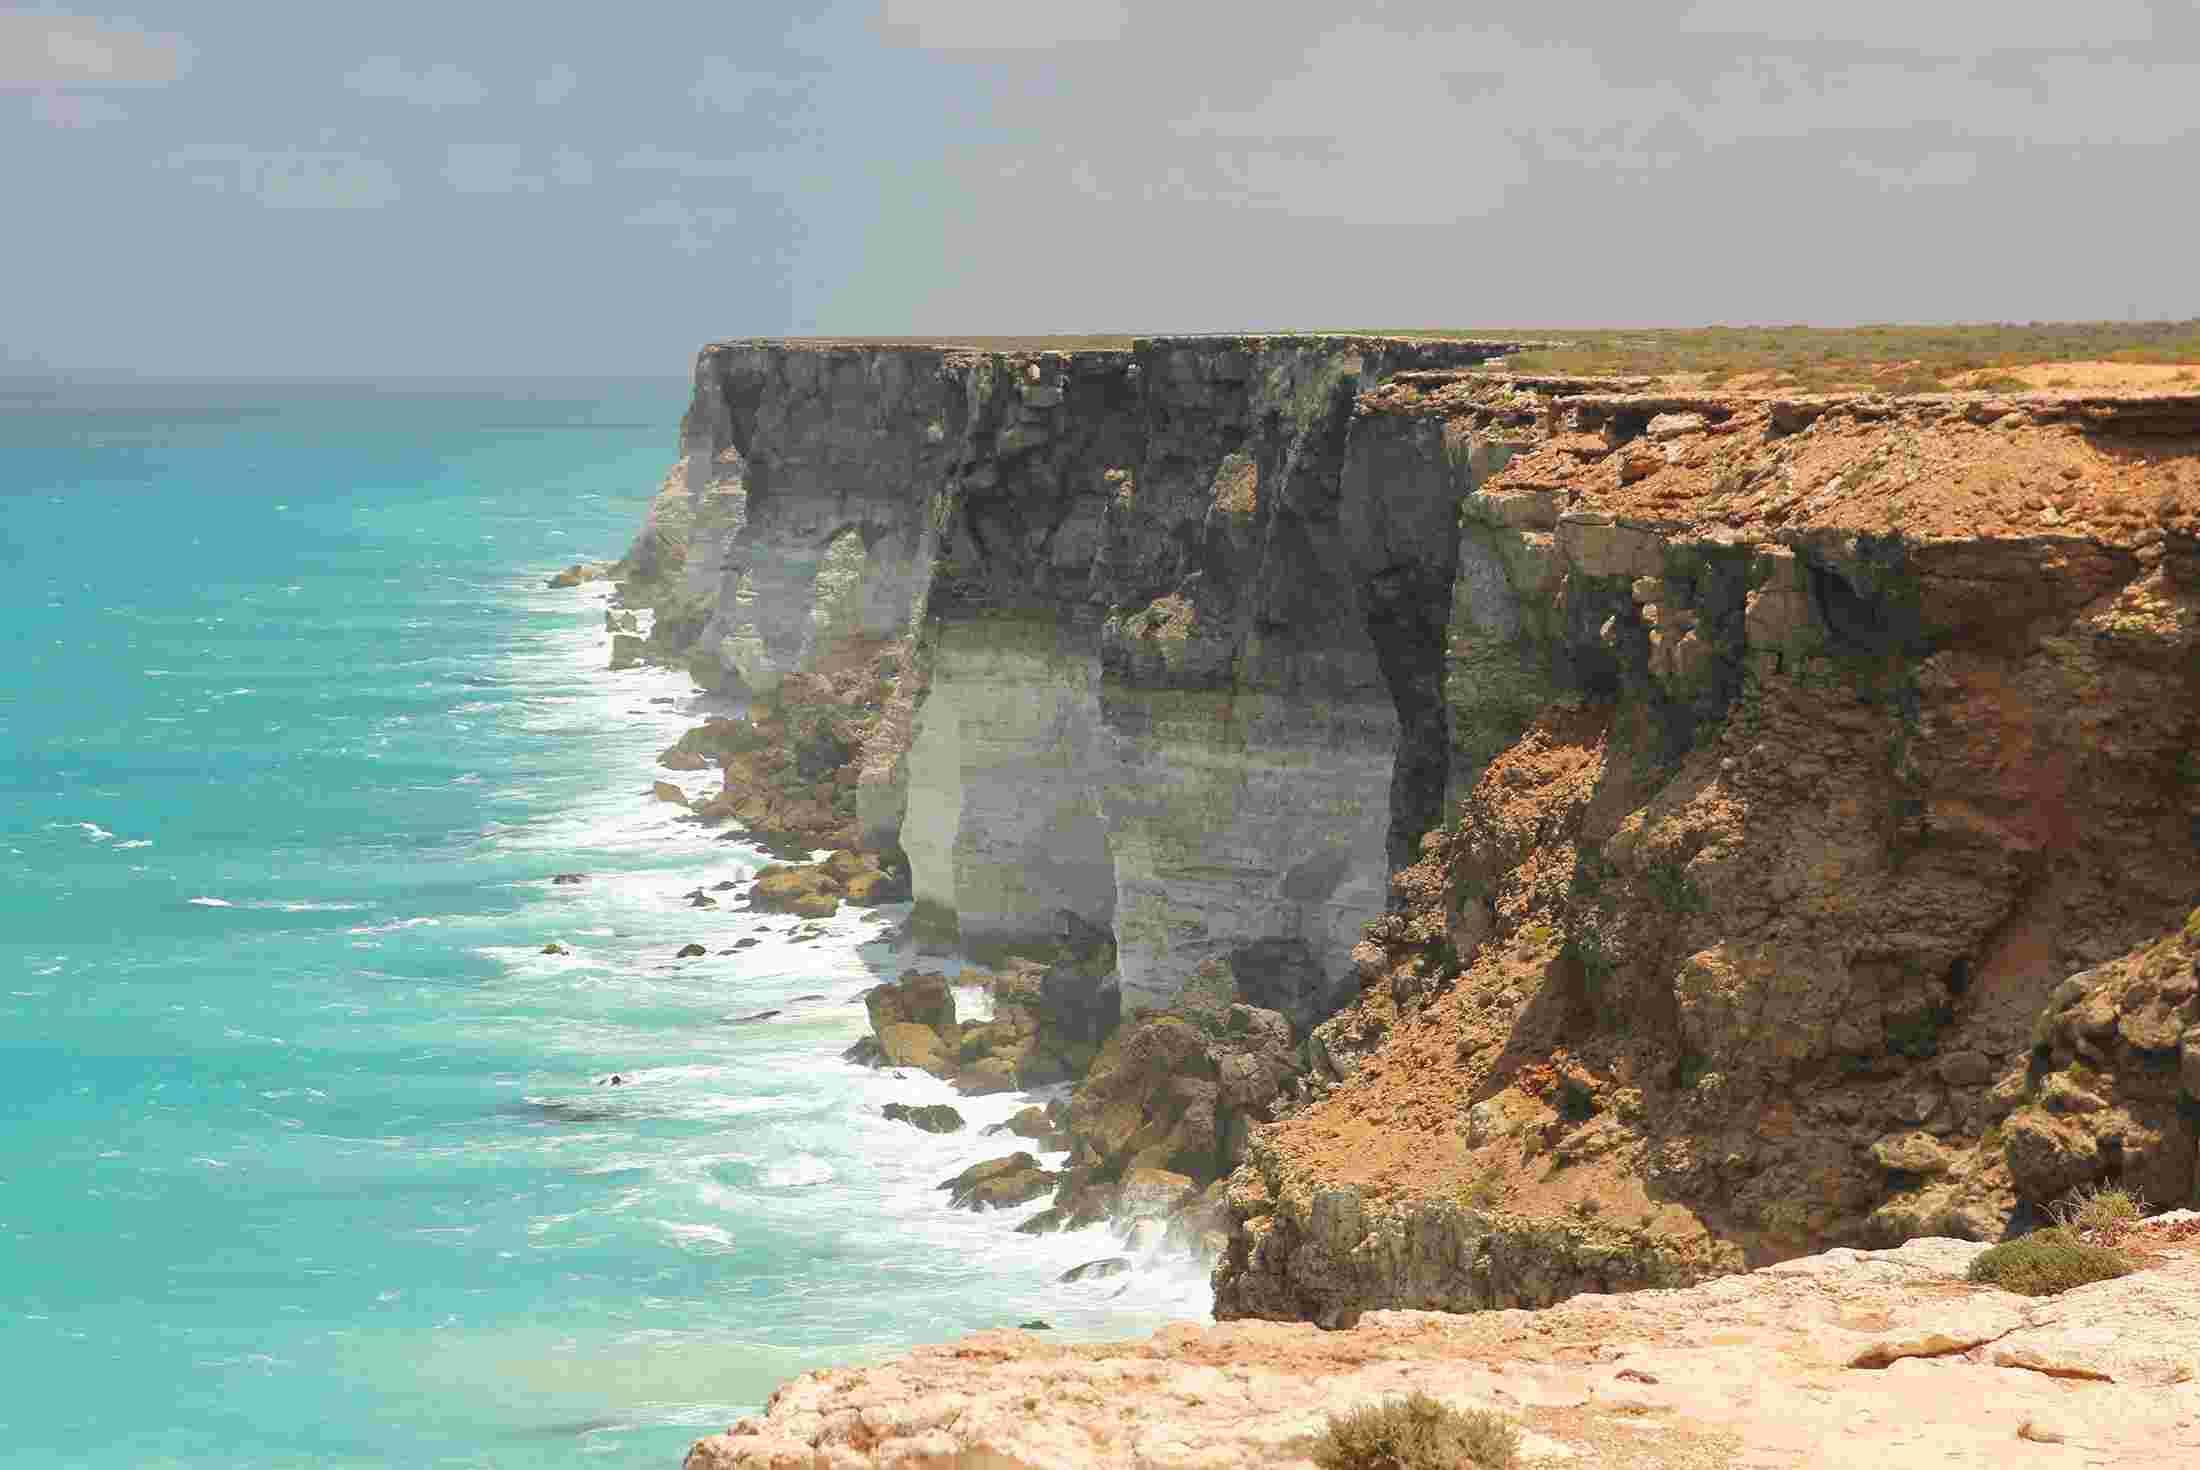 Nullarbor Coast clipart #18, Download drawings